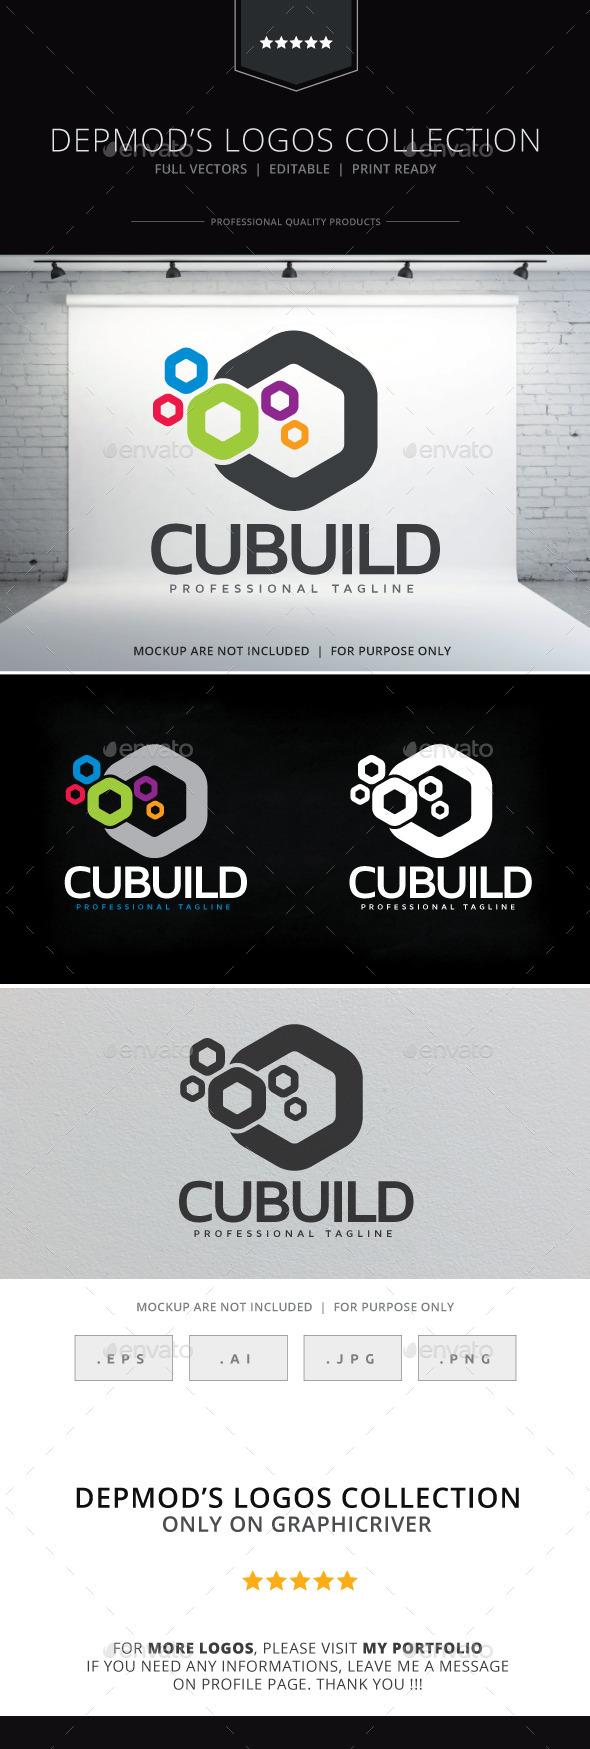 Cubuild Logo